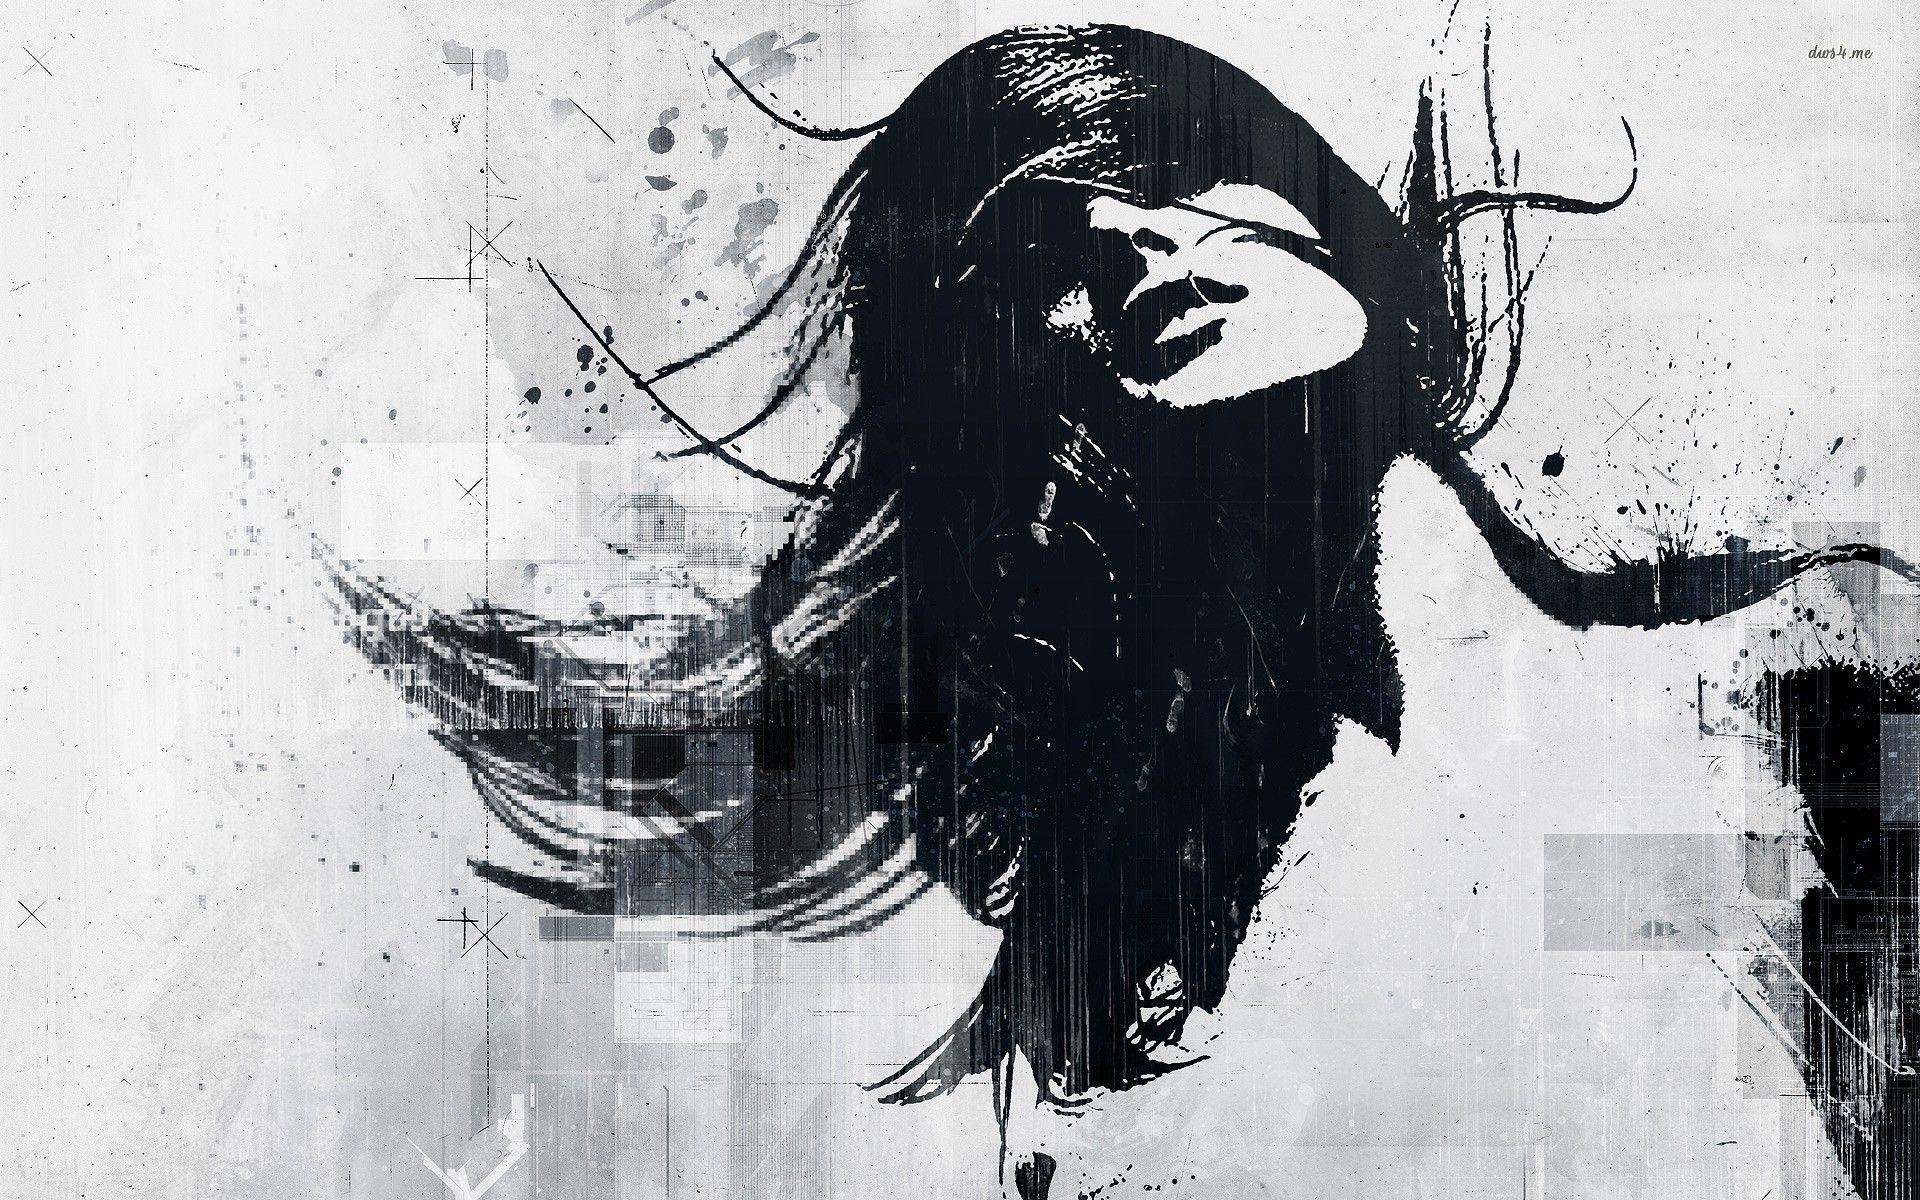 Good Wallpaper Music Portrait - 27ca2a97cf82210c655adfbb25640bda  2018_568962.jpg